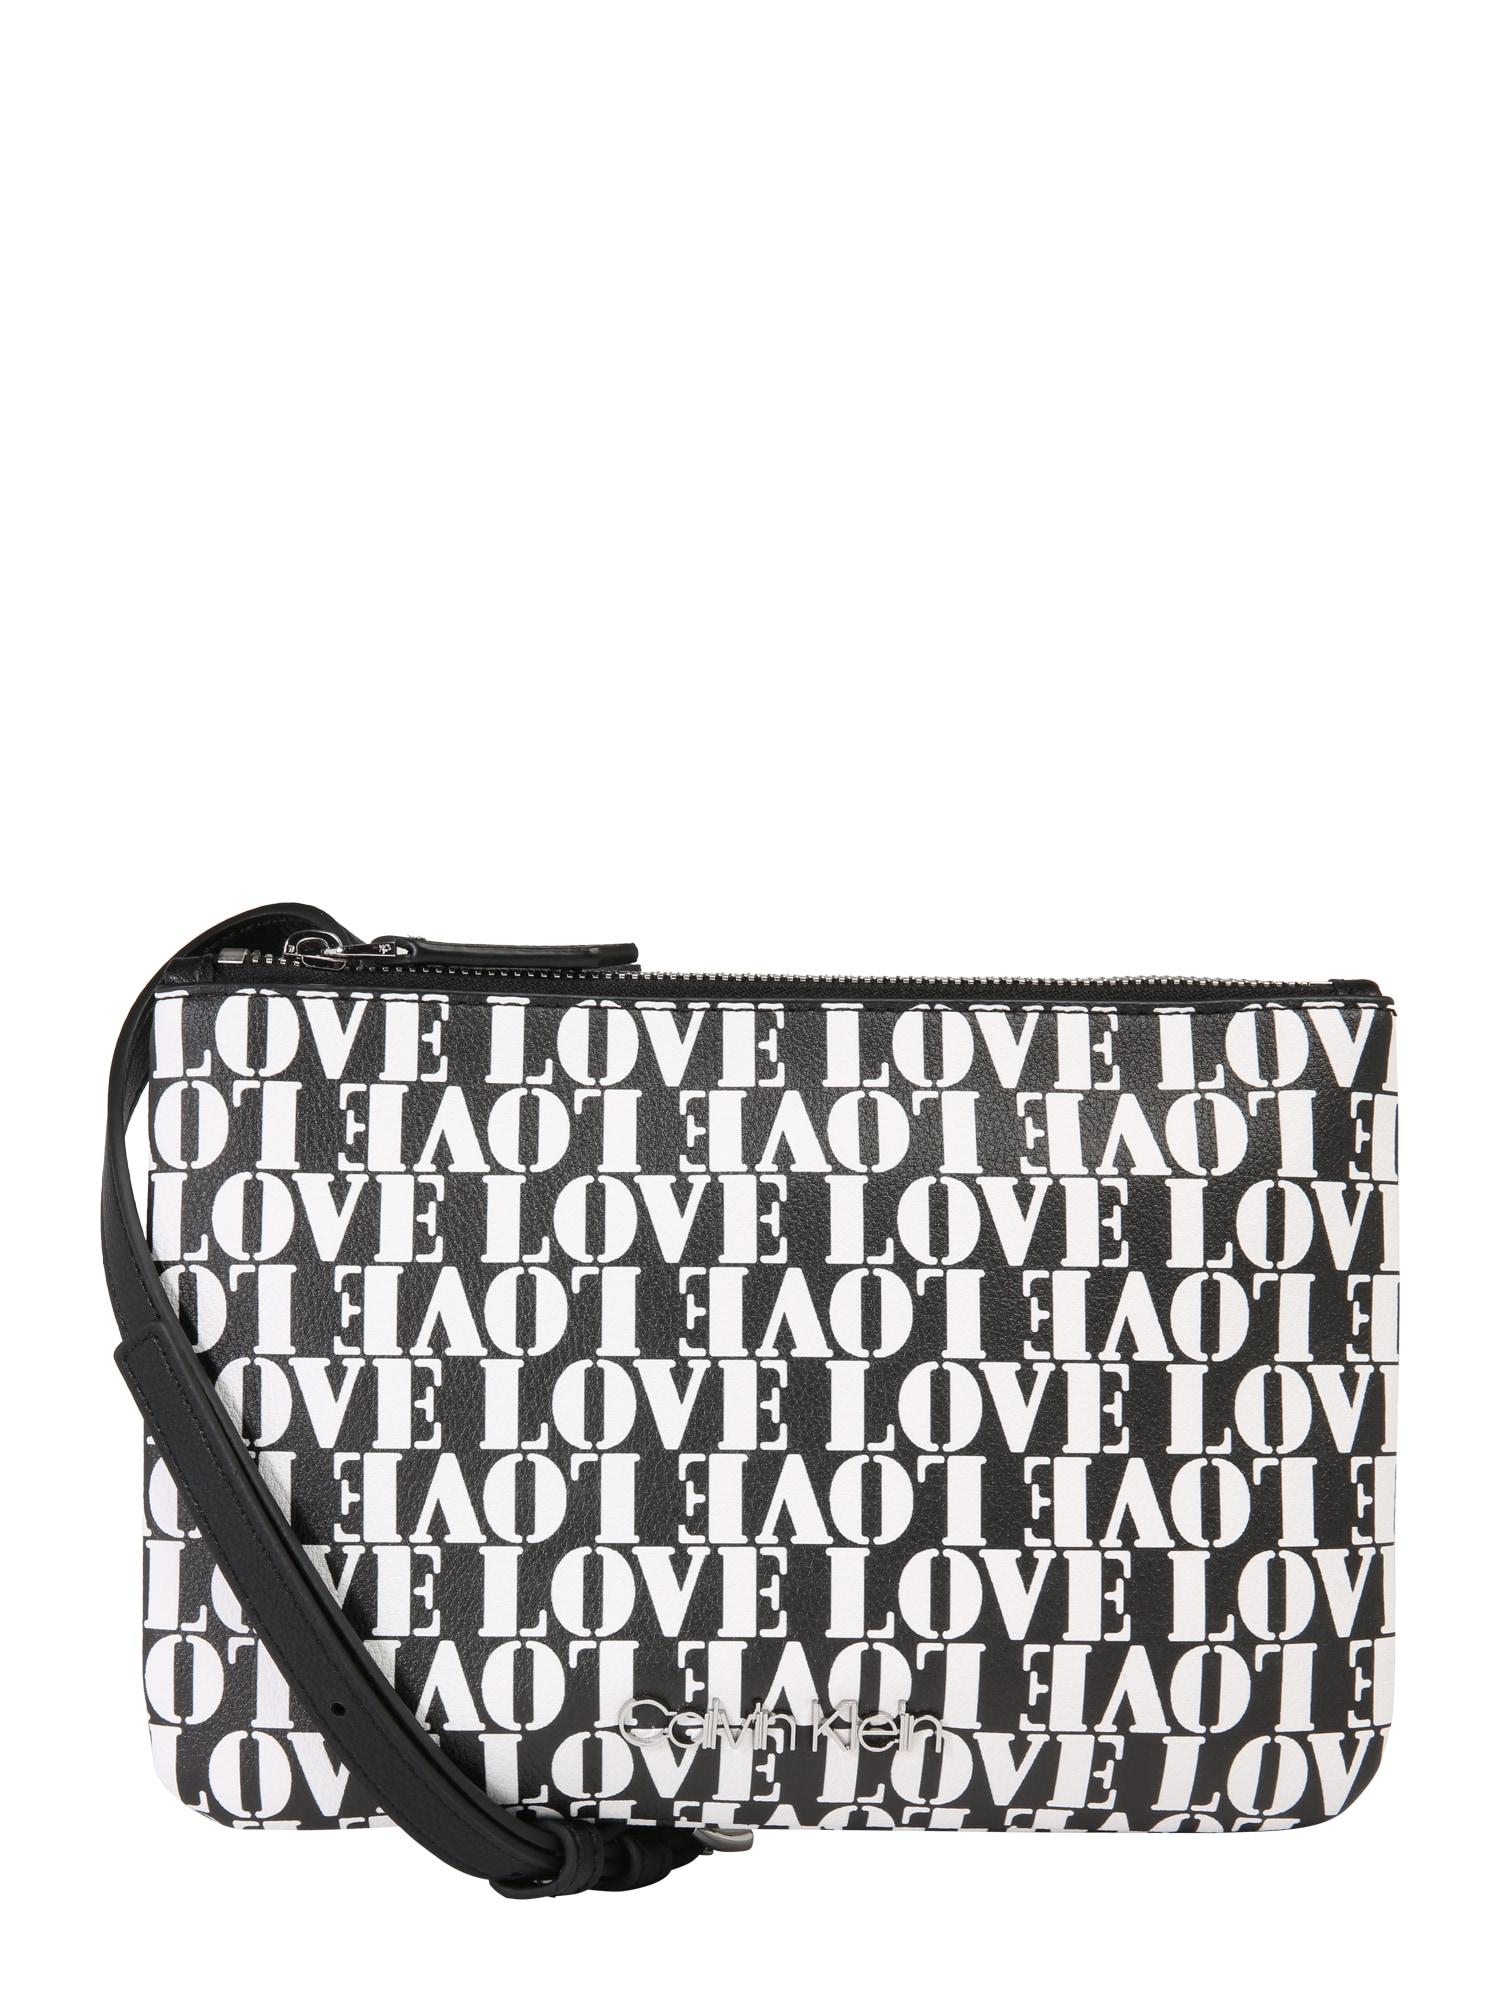 Taška přes rameno CK MUST CROSSOVER LOVE mix barev Calvin Klein